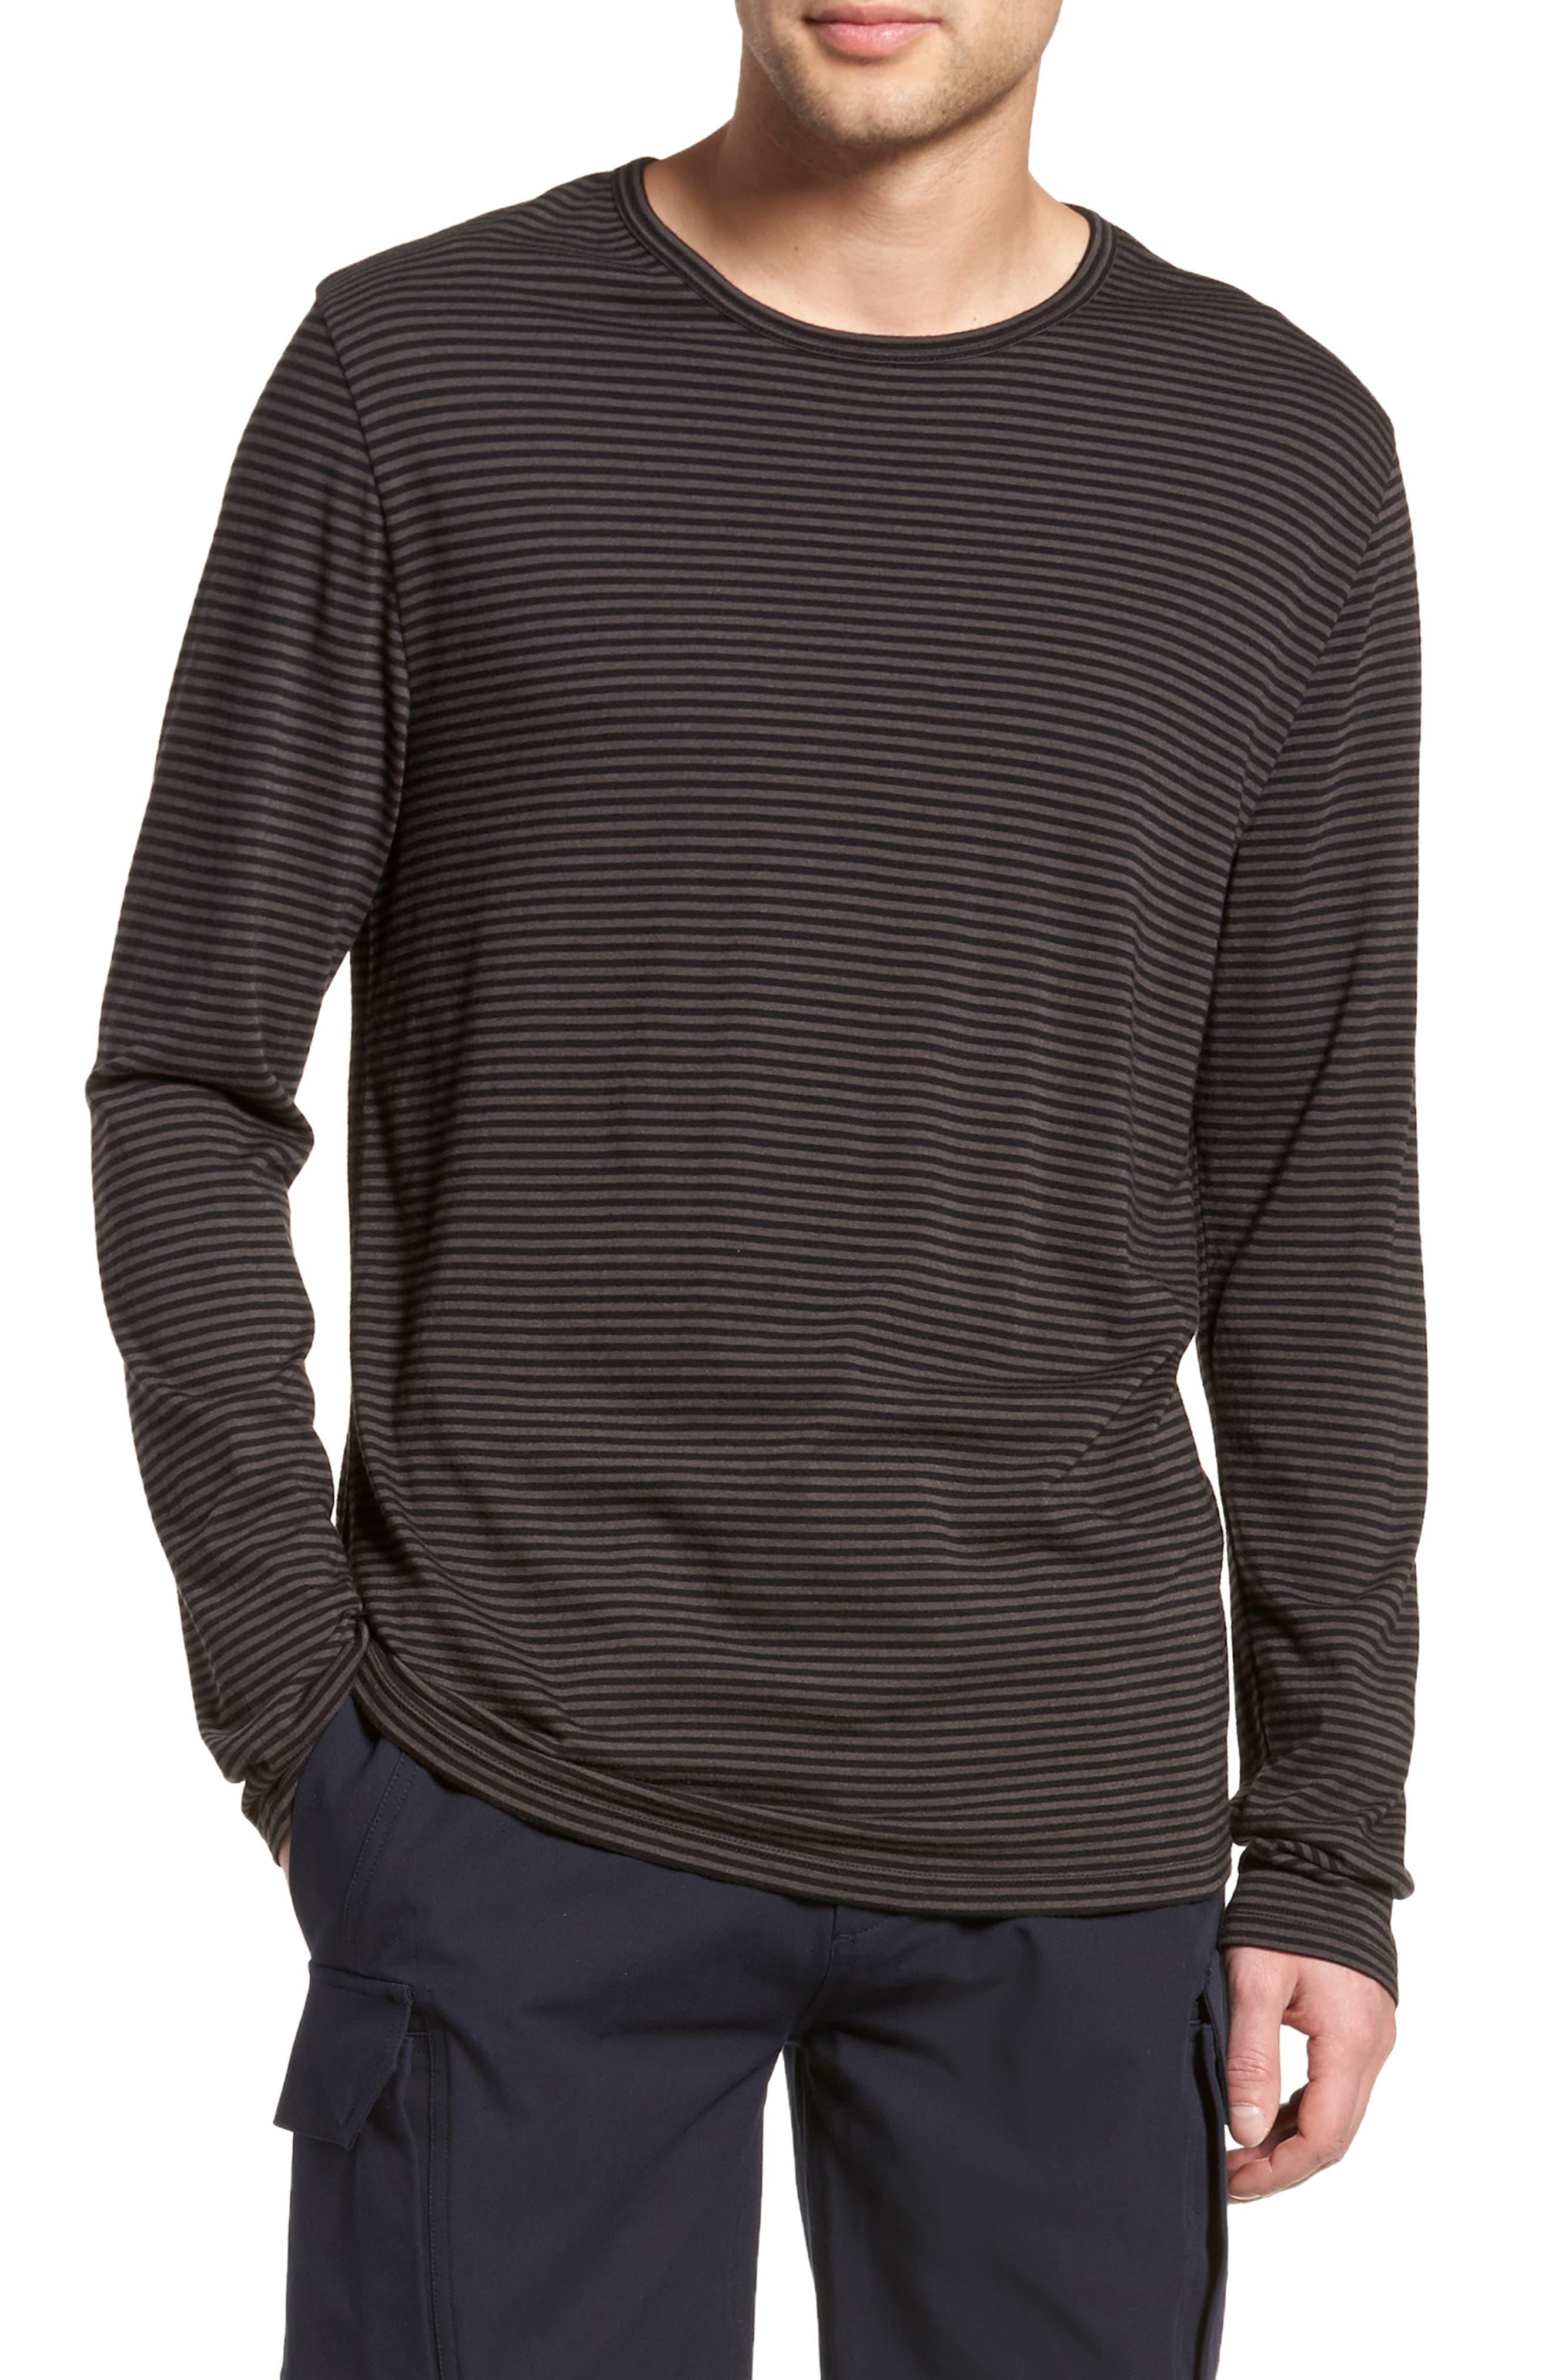 Feeder Stripe Long Sleeve Shirt,                         Main,                         color, Black/ Stone Grey